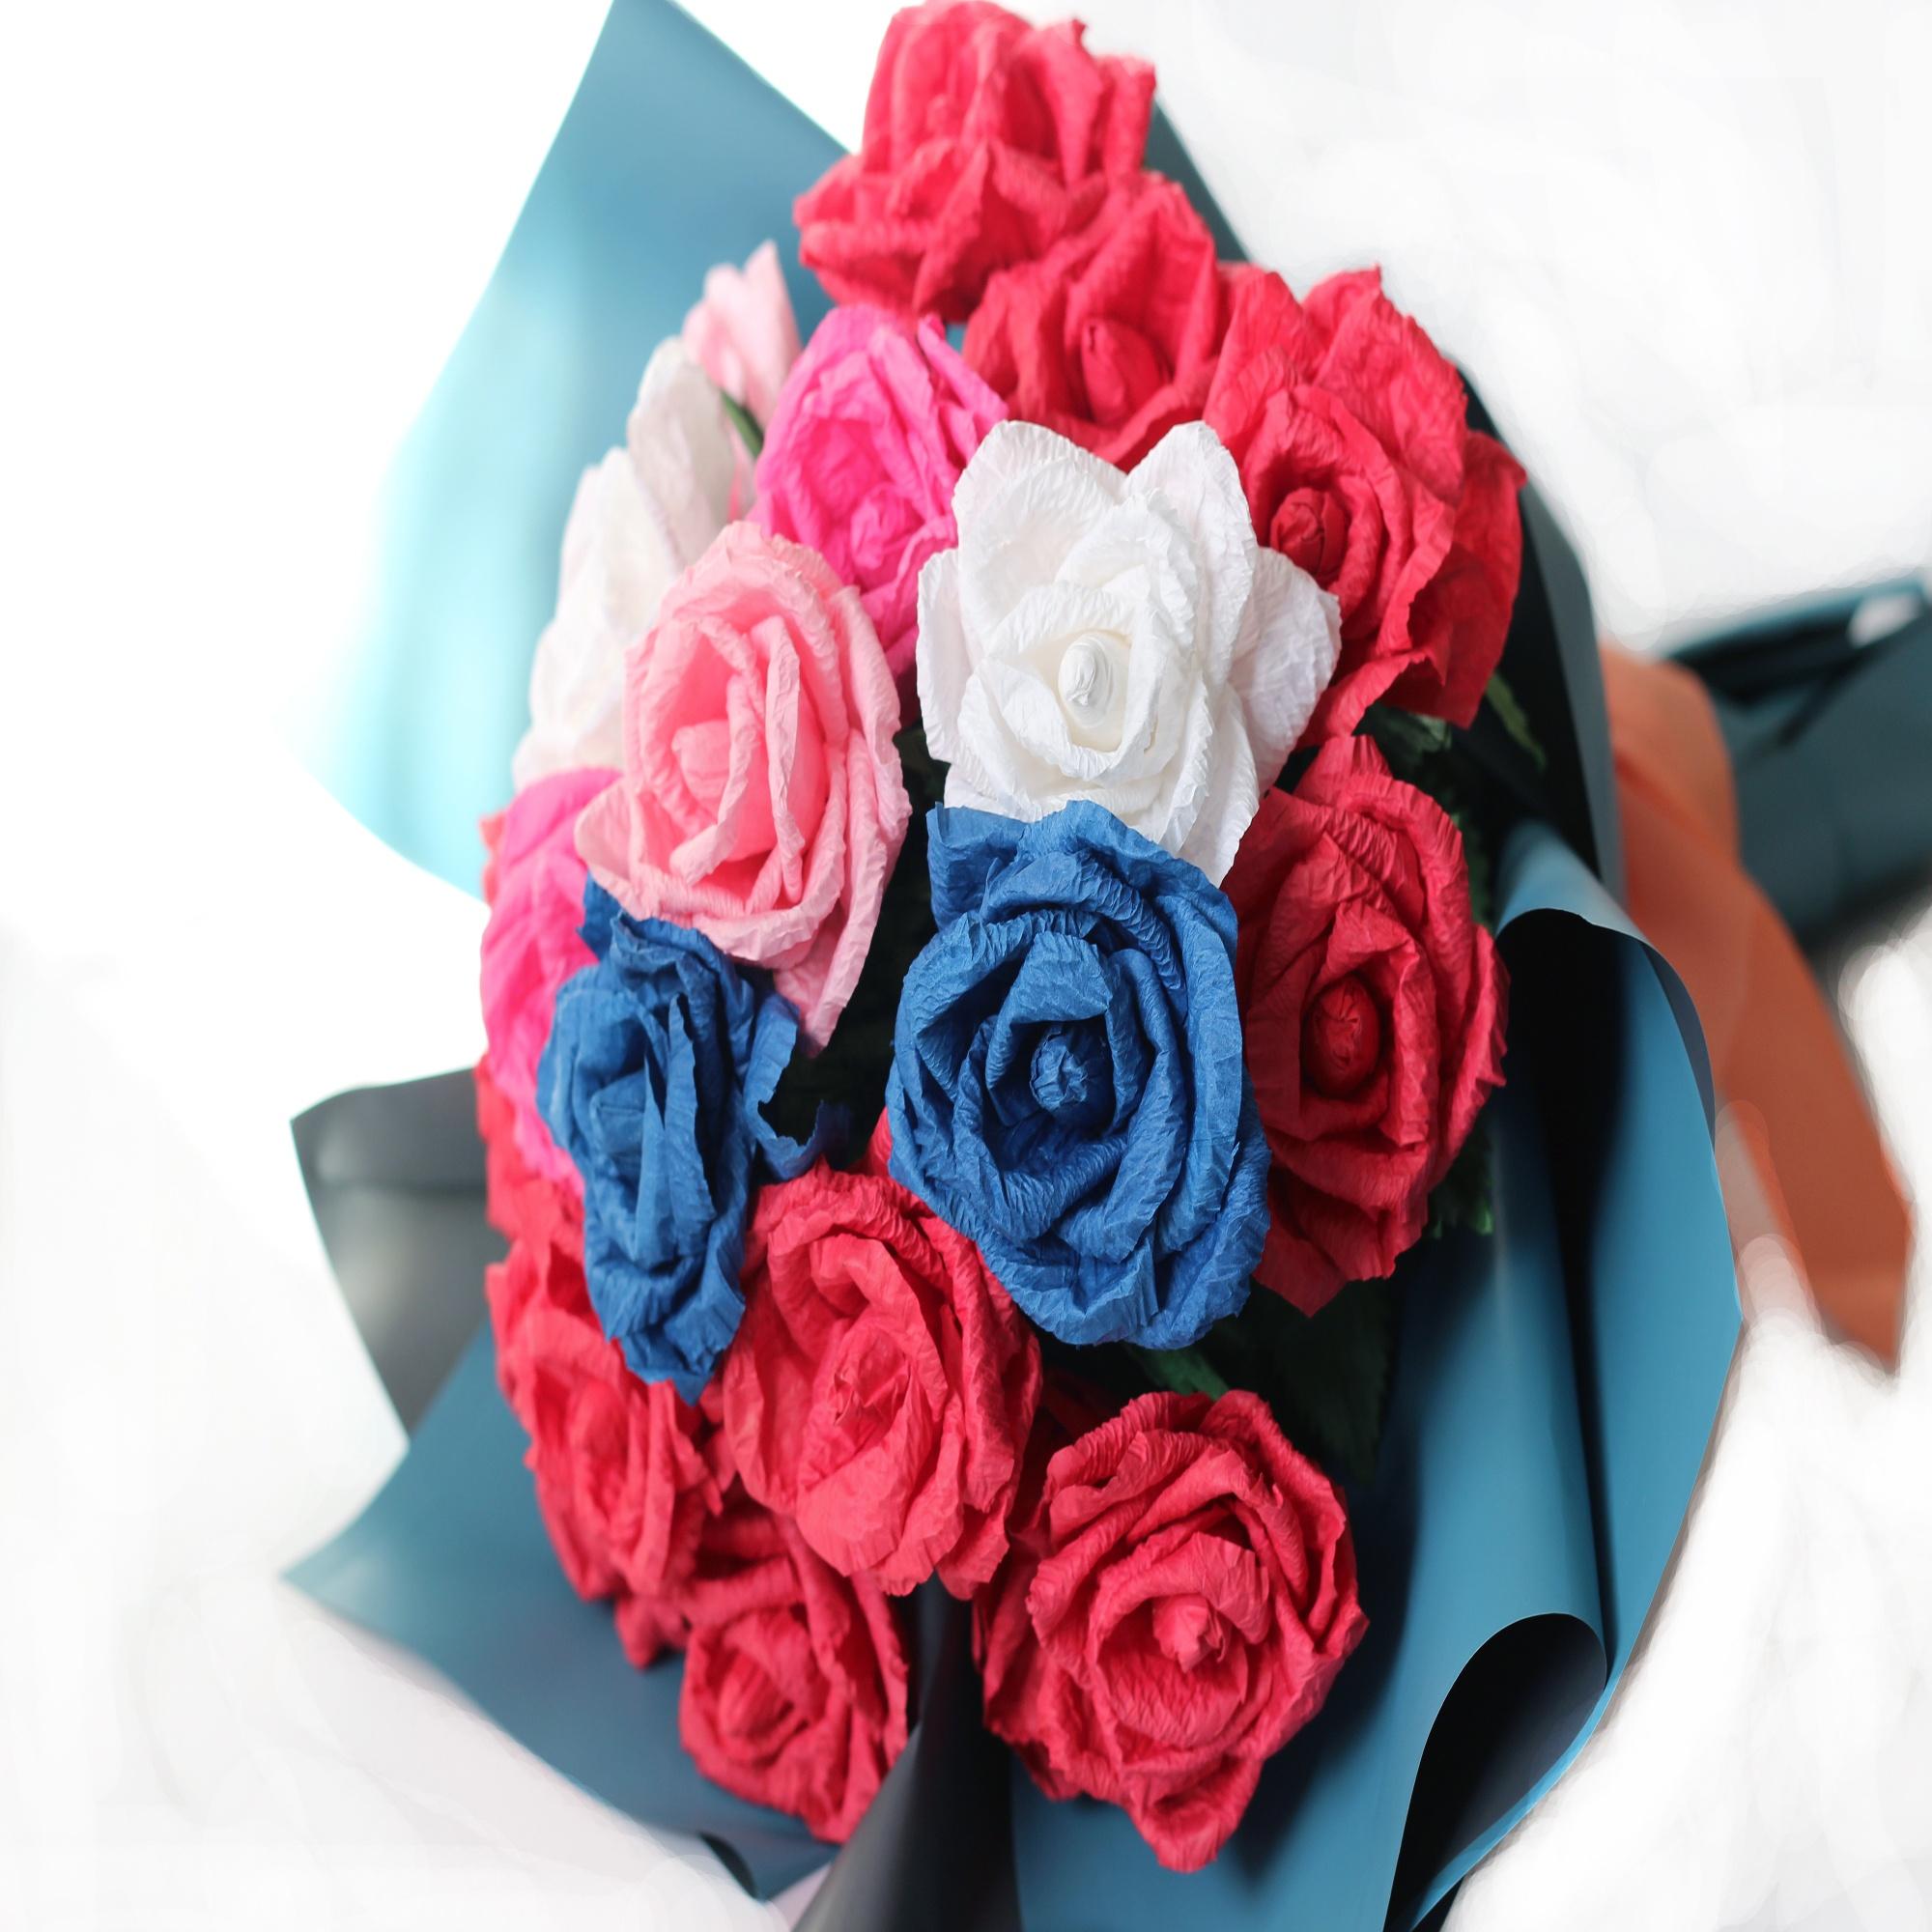 OEM ODM DIY Handcraft Kits Home Decoration Artificial Fake Paper Flower Making Supplies Rose